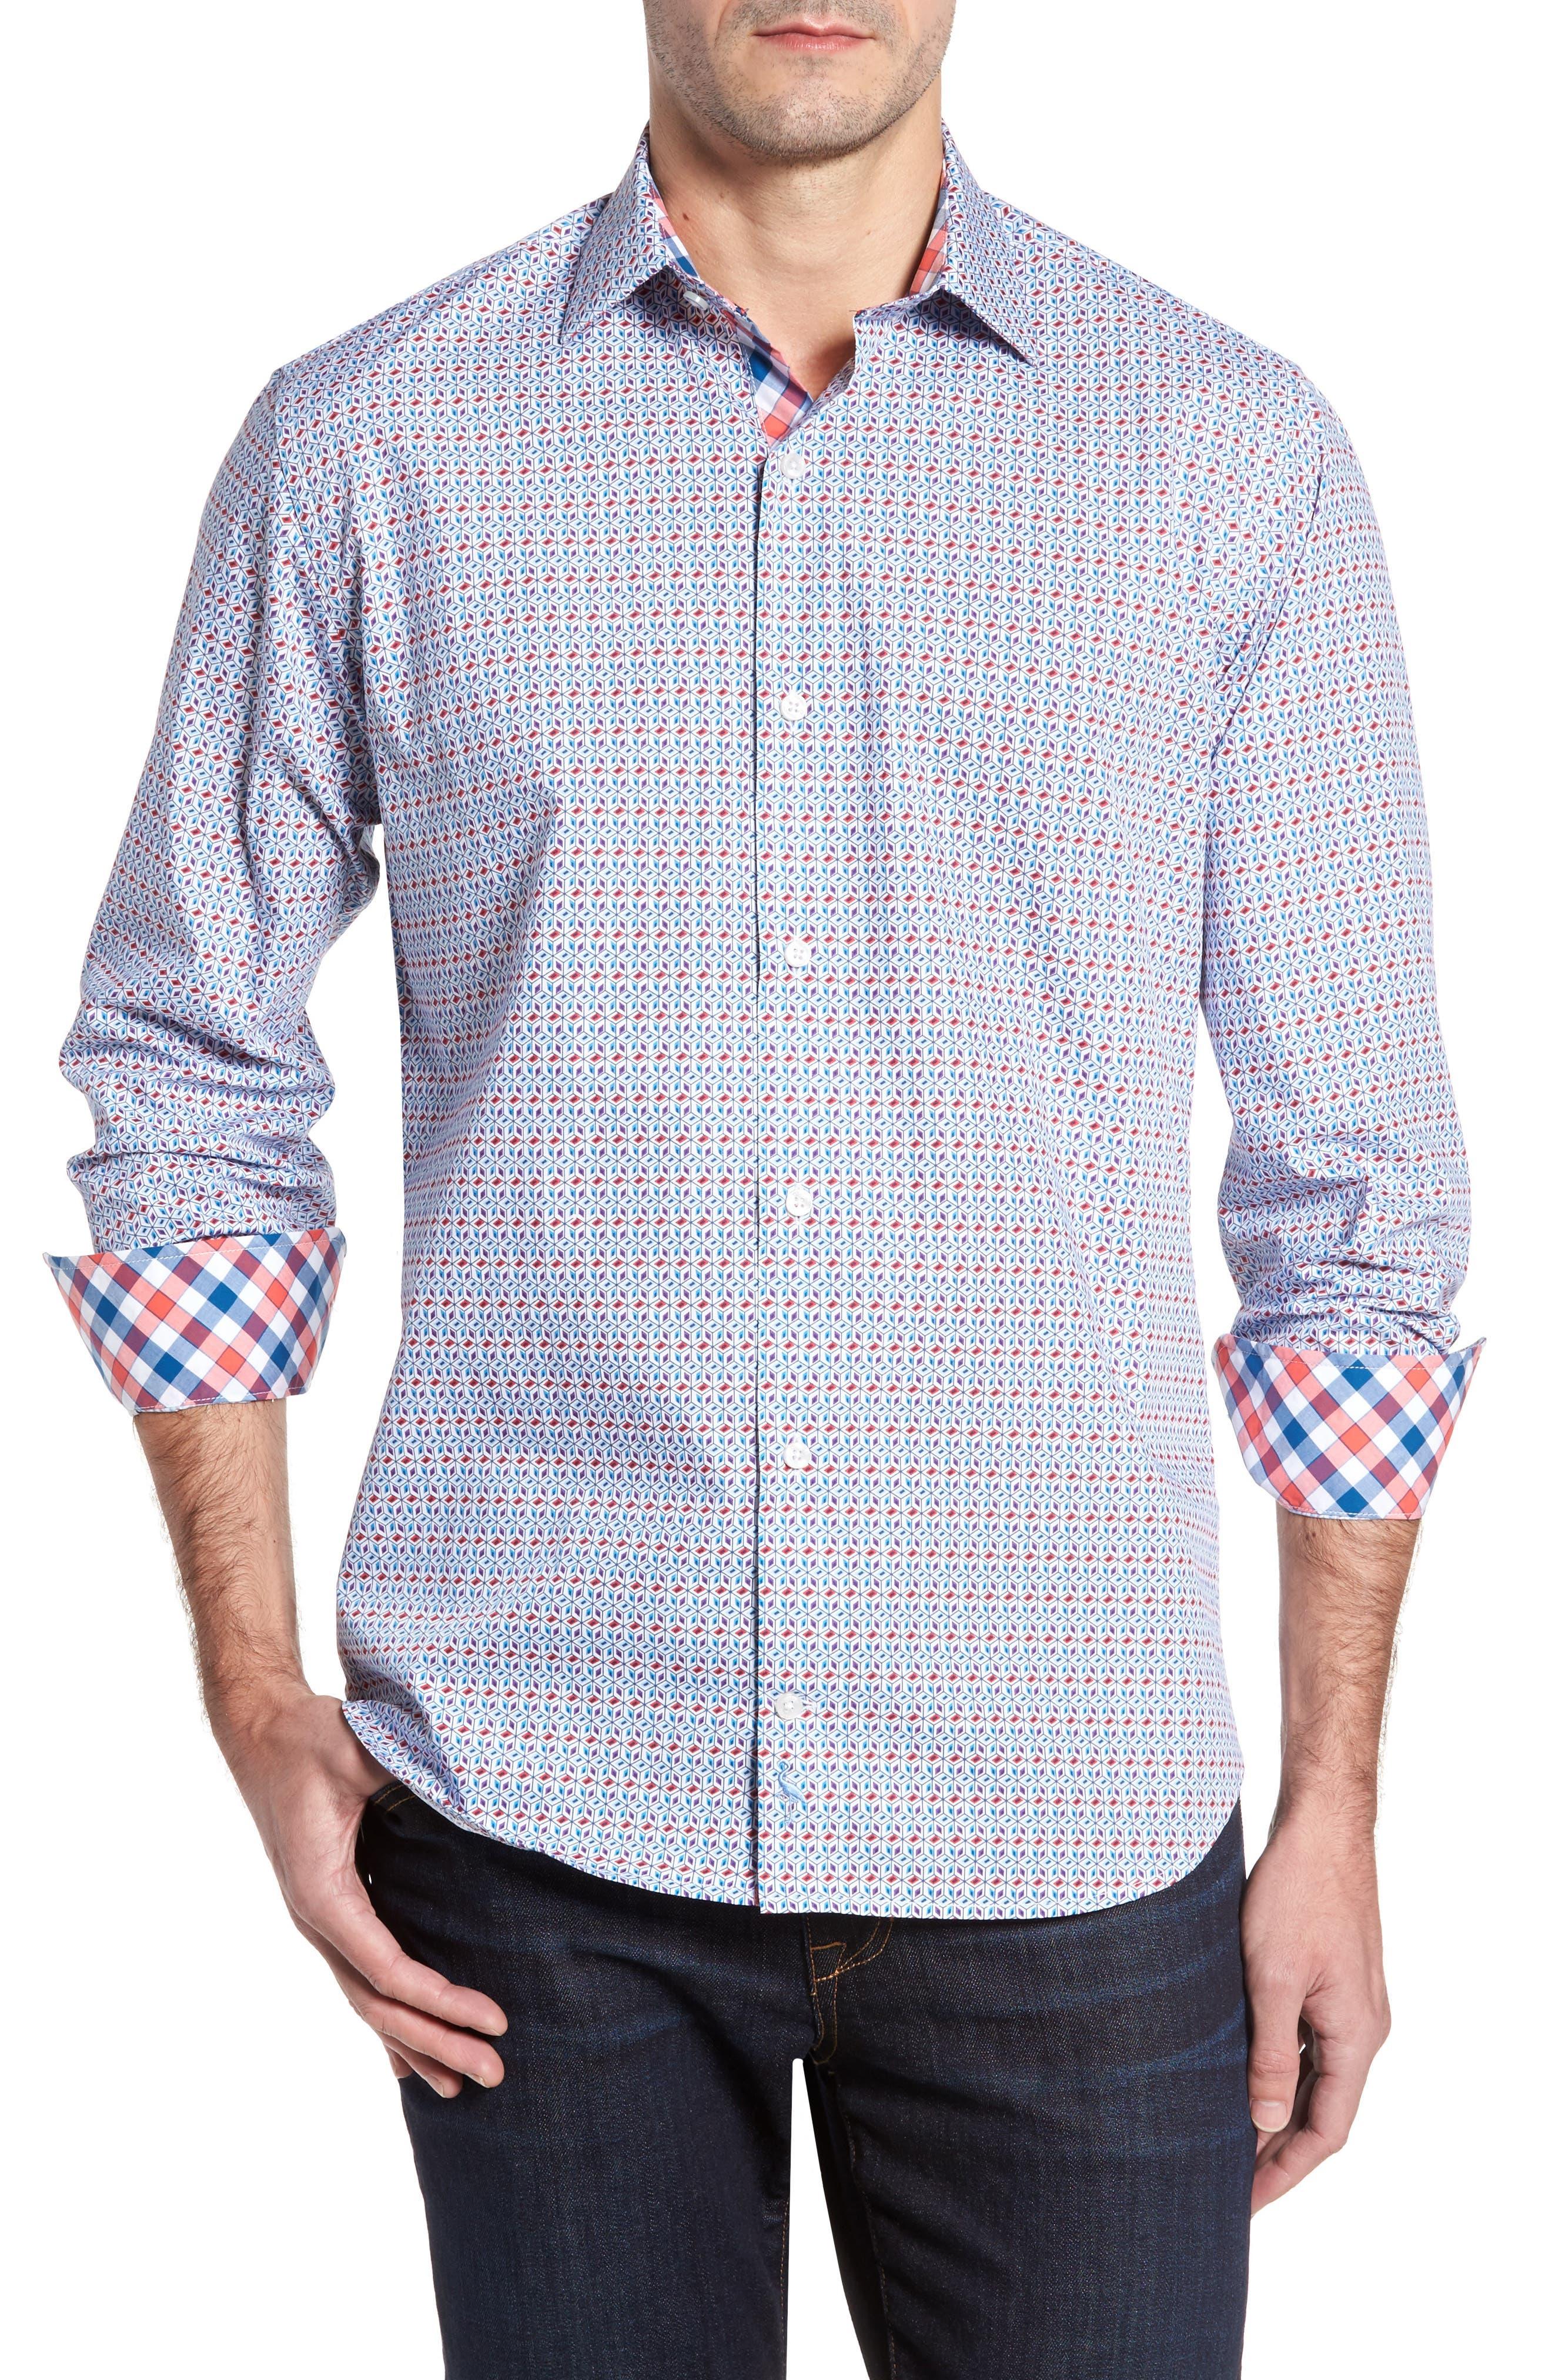 Main Image - TailorByrd Angia Print Sport Shirt